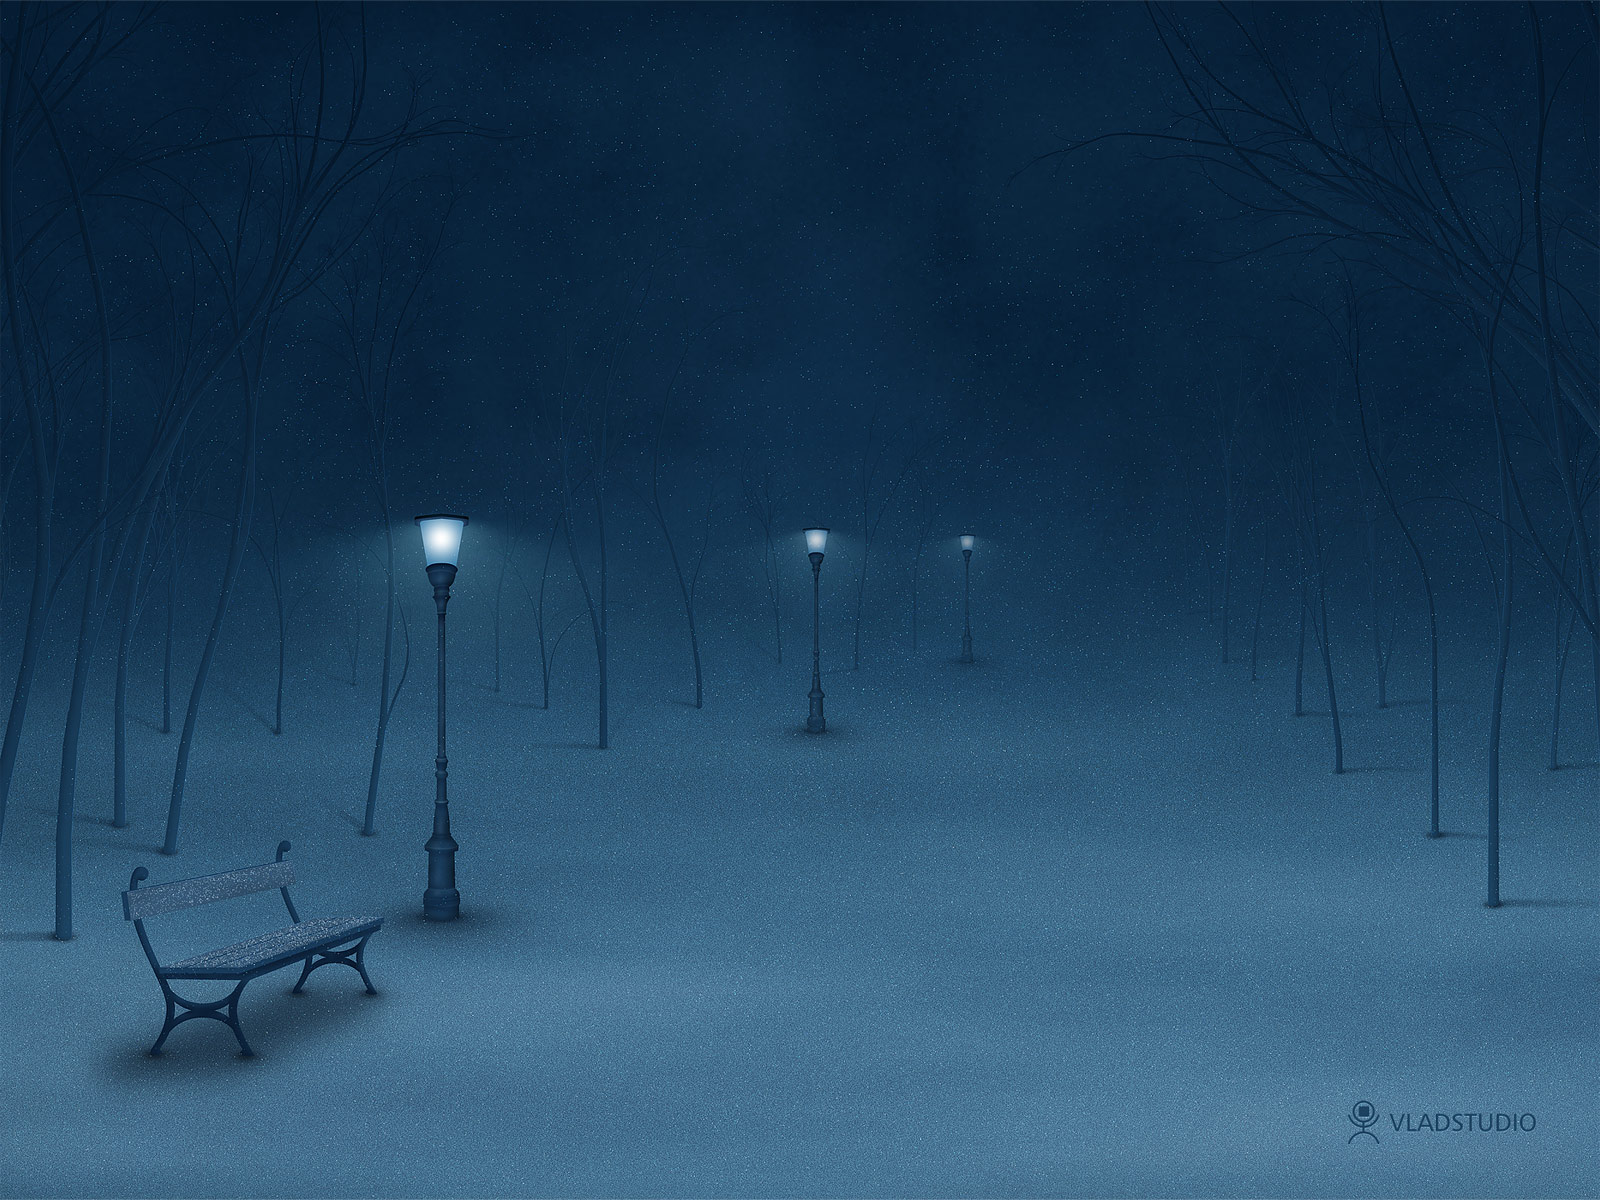 Momentary Lapse of Reason Night 1600x1200